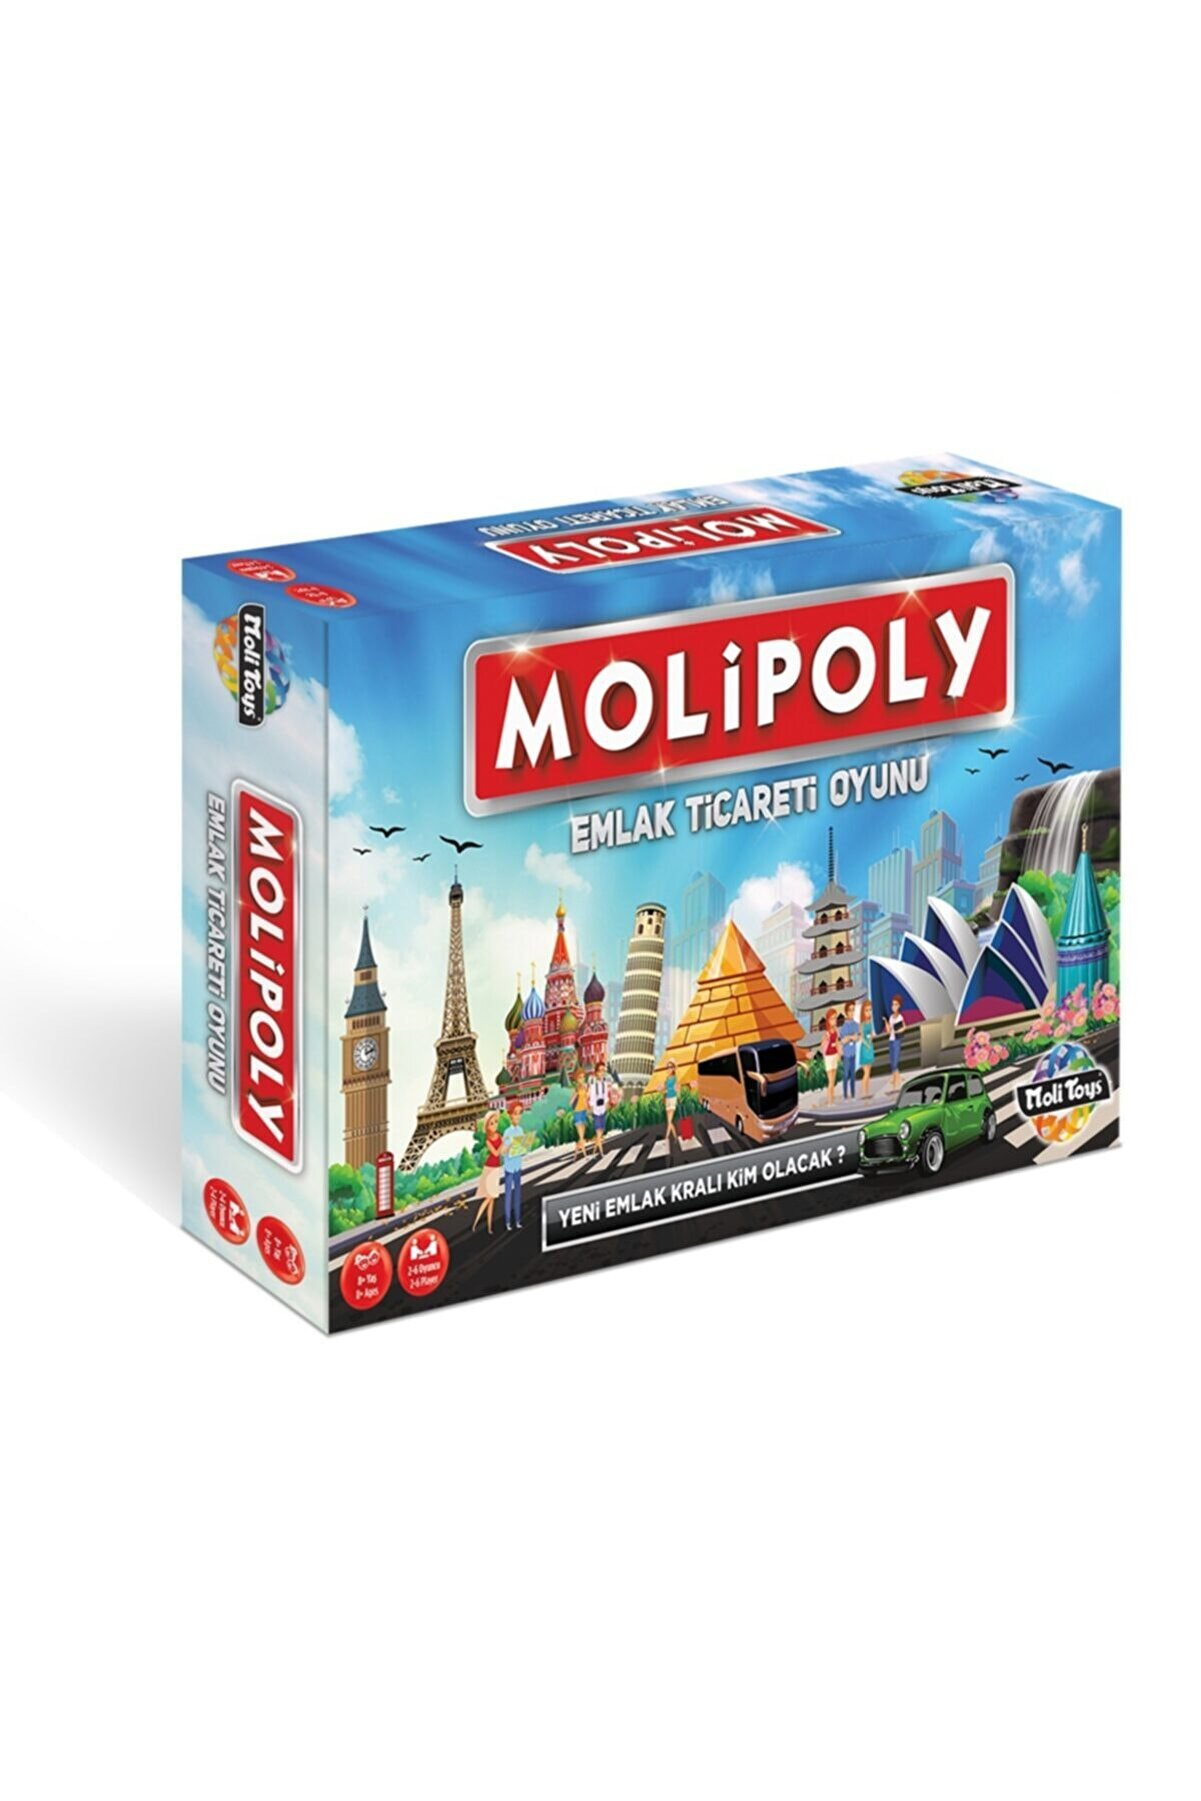 Moli Toys Molipoly Monopoly Monopoli Metropol Mega City Emlak Ticaret Oyunu Aile Oyunu Yeni Model